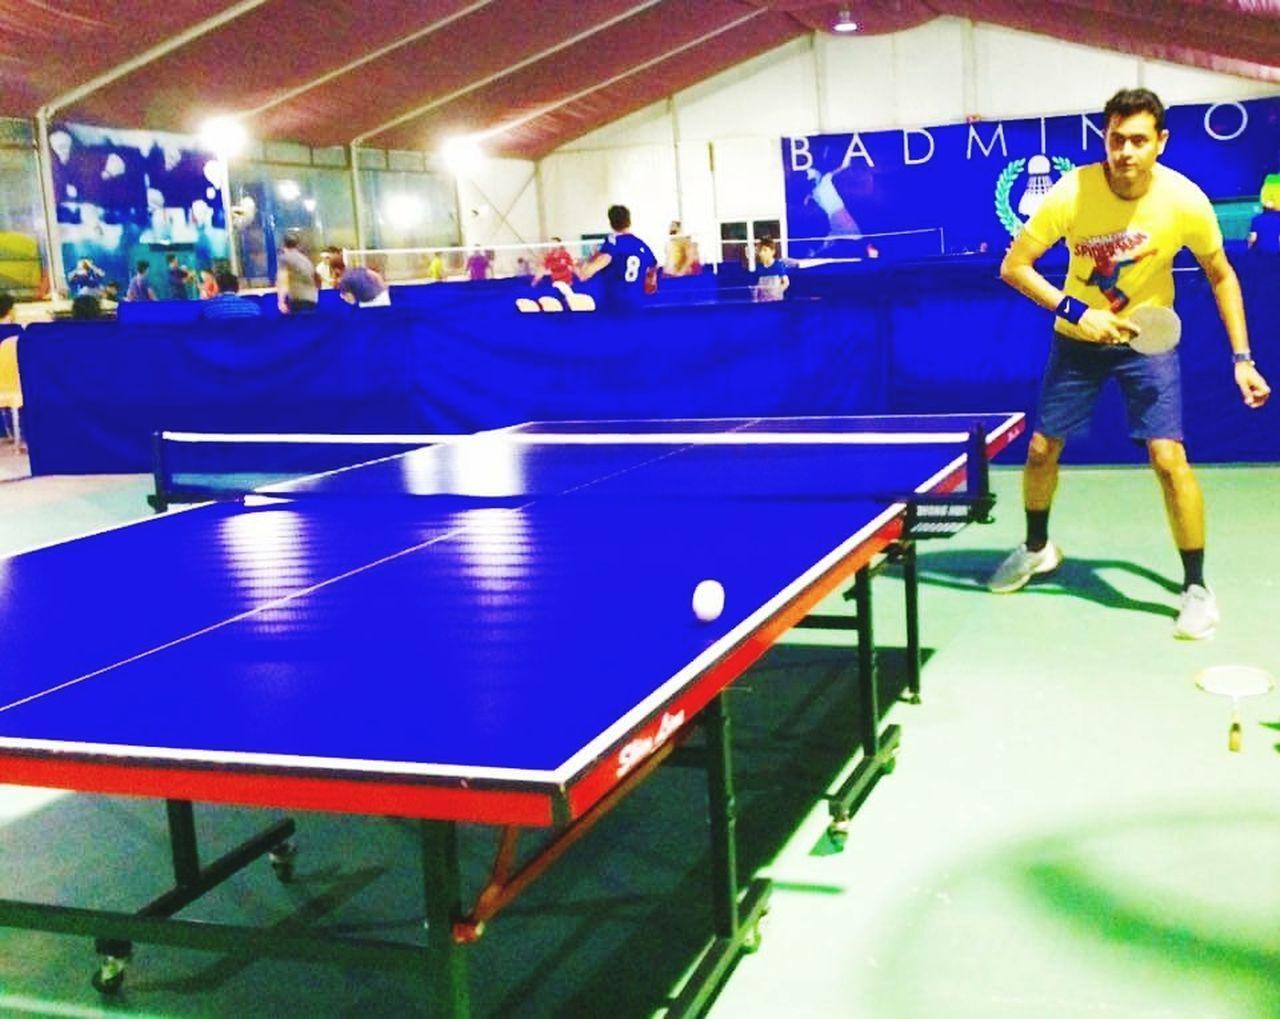 Tennis 🎾 Tenniscourt Tennis Player Sports Sport Lifestyles Competition Men Me Excercise Fitnesslifestyle  HERO That's Me Hello World Rathod Pakistan Fitnesslifestyle  Today's Hot Look Karachi Actor Man Confidence  Check This Out Hi! Confidence